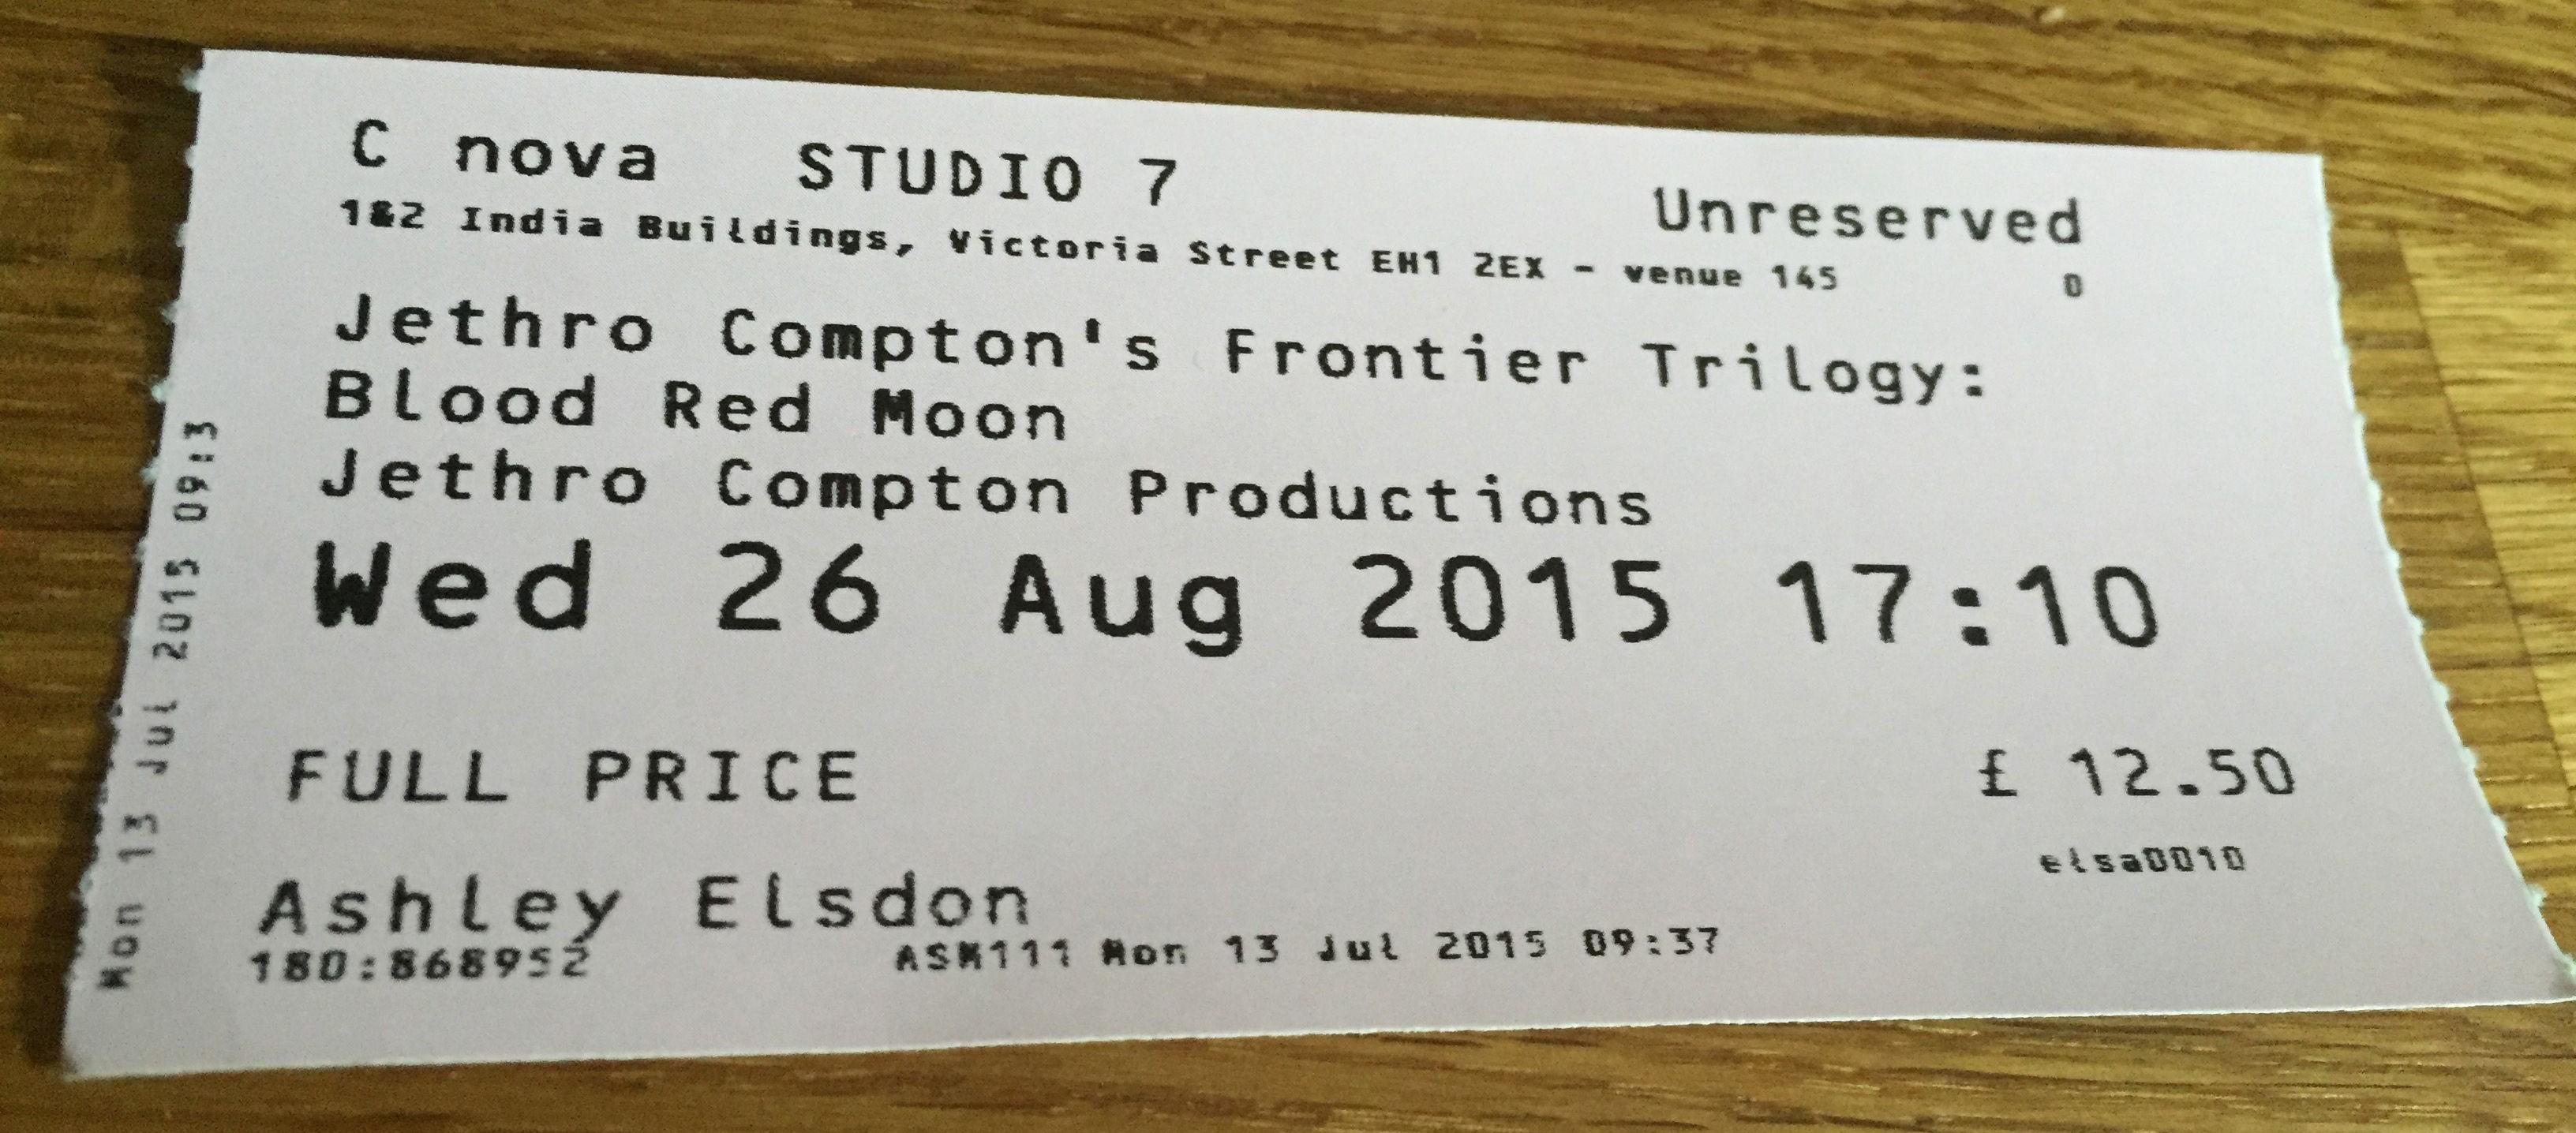 Edinburgh Fringe 2015: Frontier Trilogy - Red Moon